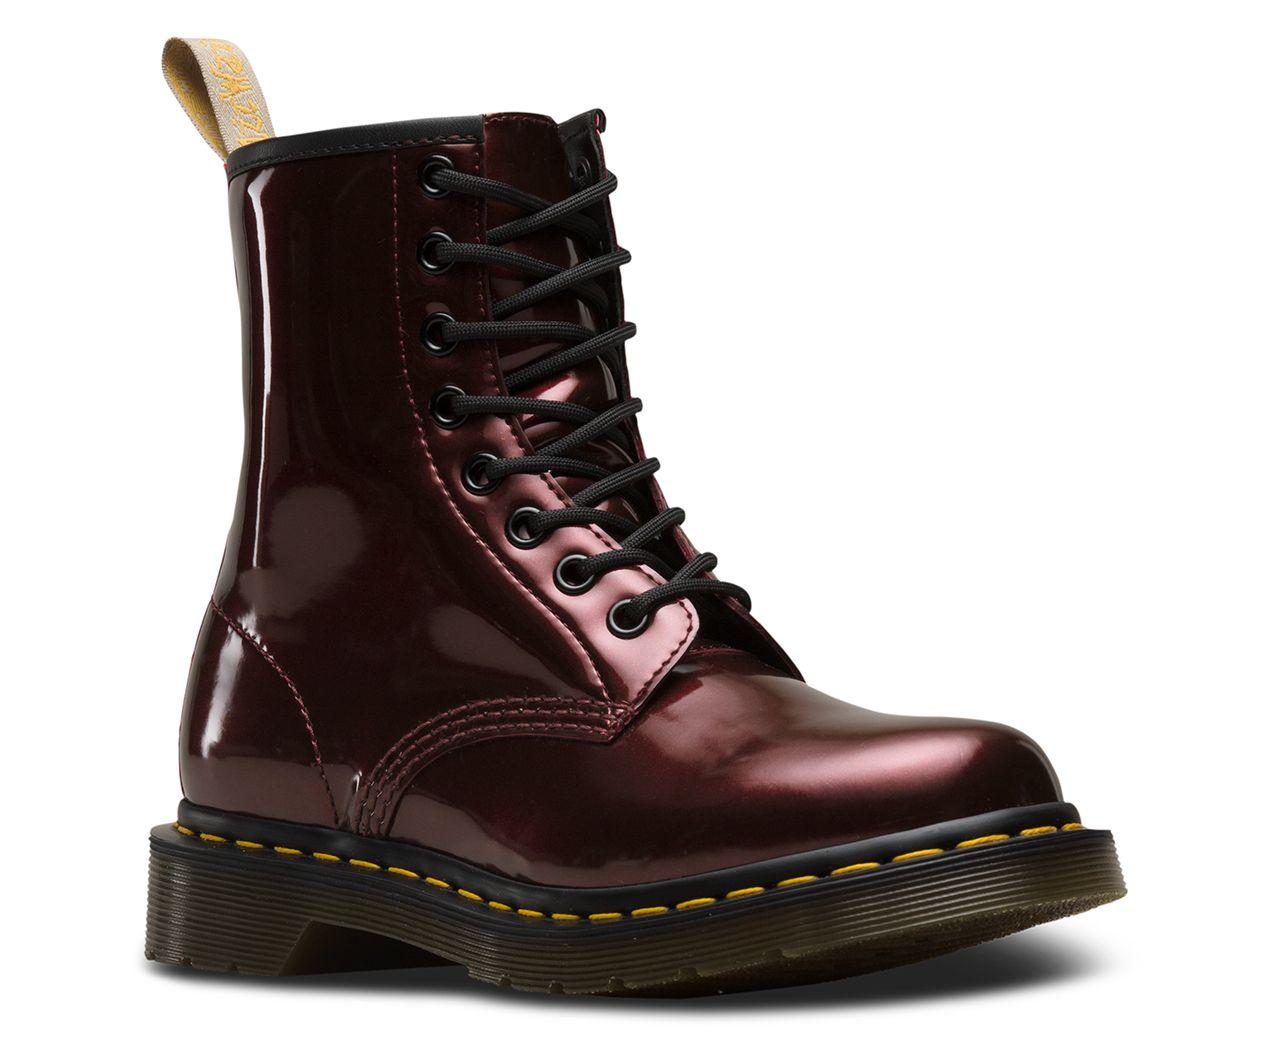 Dr. Martens 1460 Vegan Chrome Boot | Boots, Doc martens, Doc